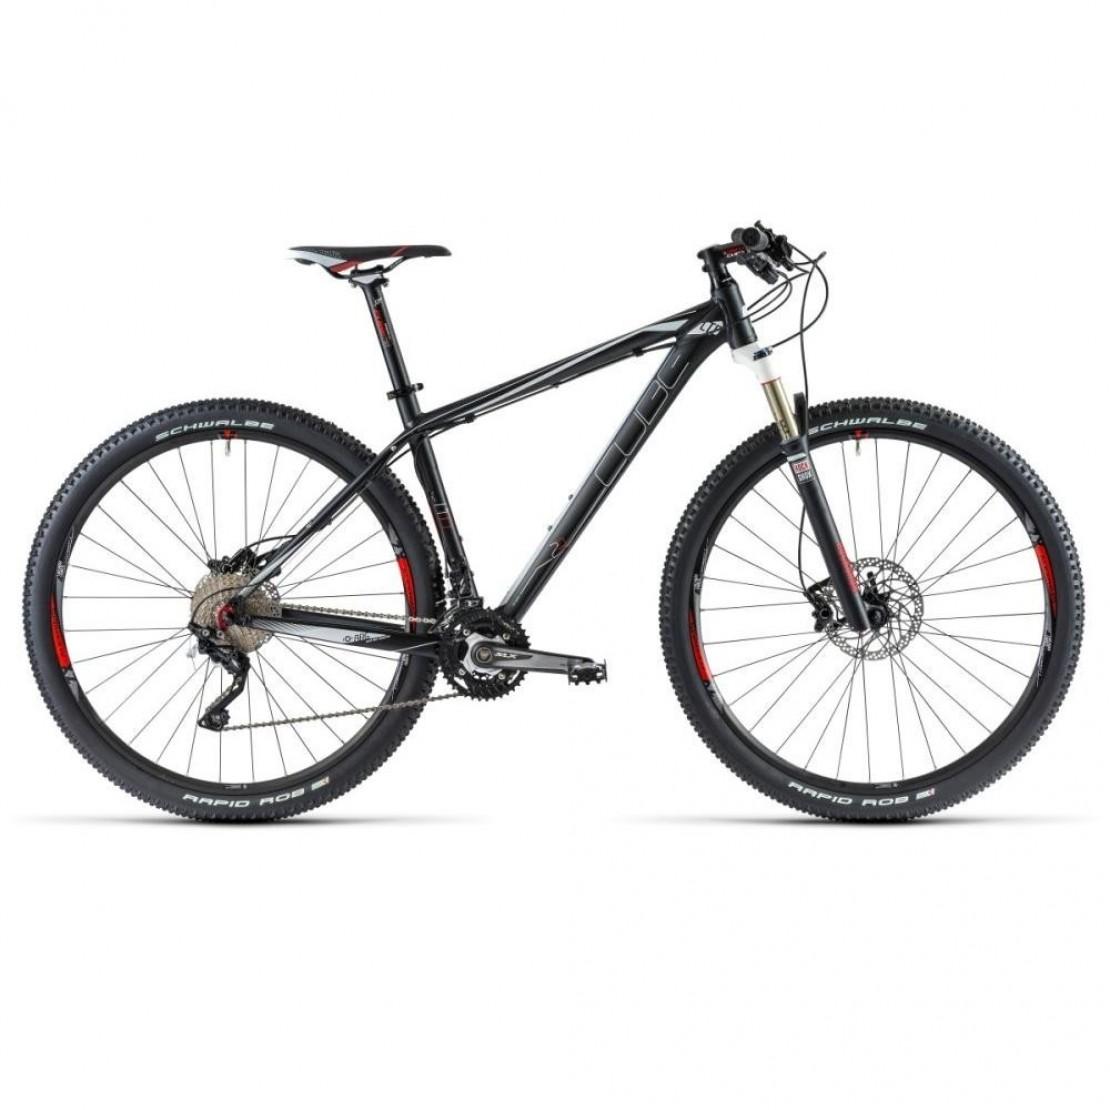 Cube LTD Race 29 Blackline 2014 29er Mountain bike